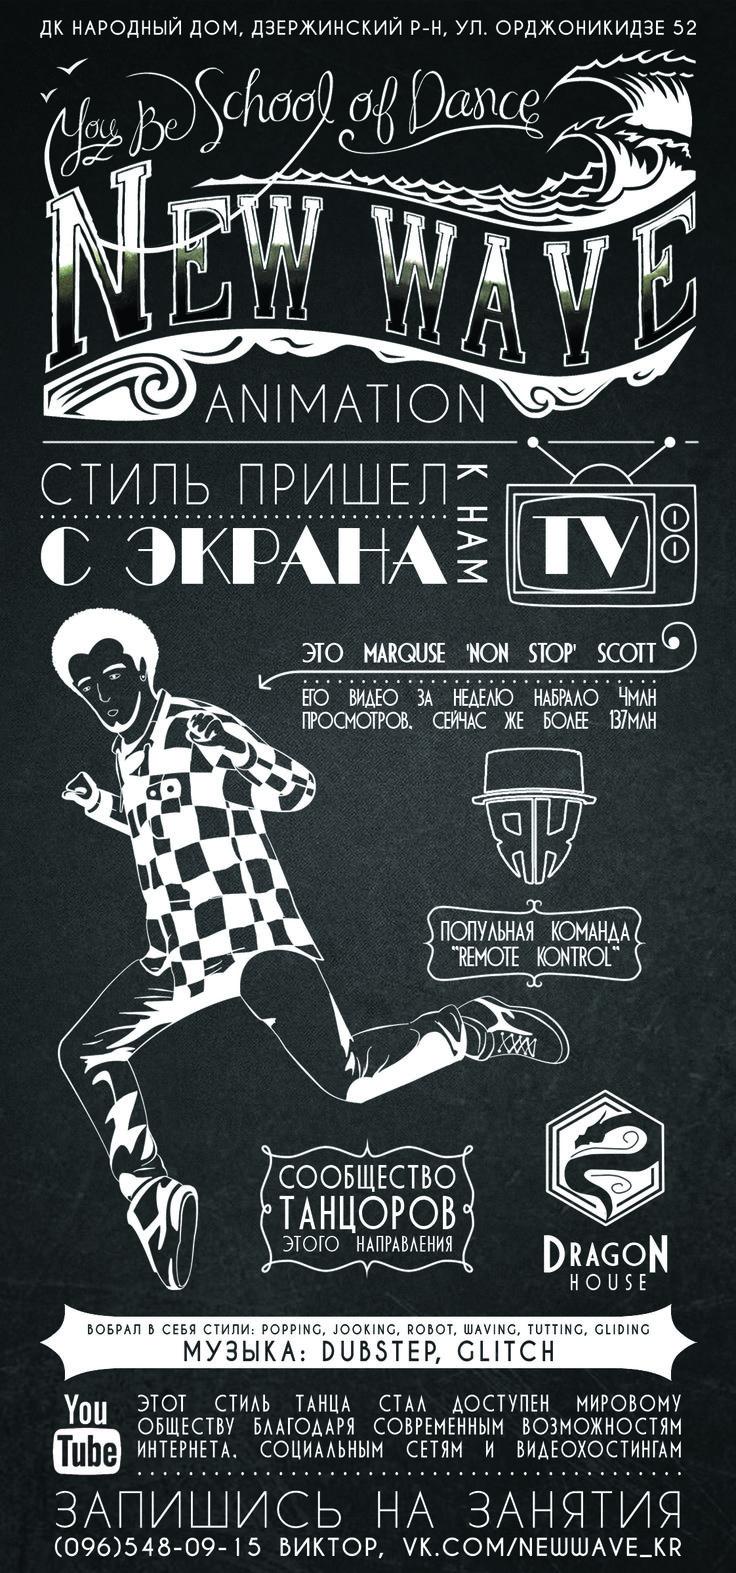 ФЛАЕР ШКОЛЫ ТАНЦЕВ NEW WAVE 1